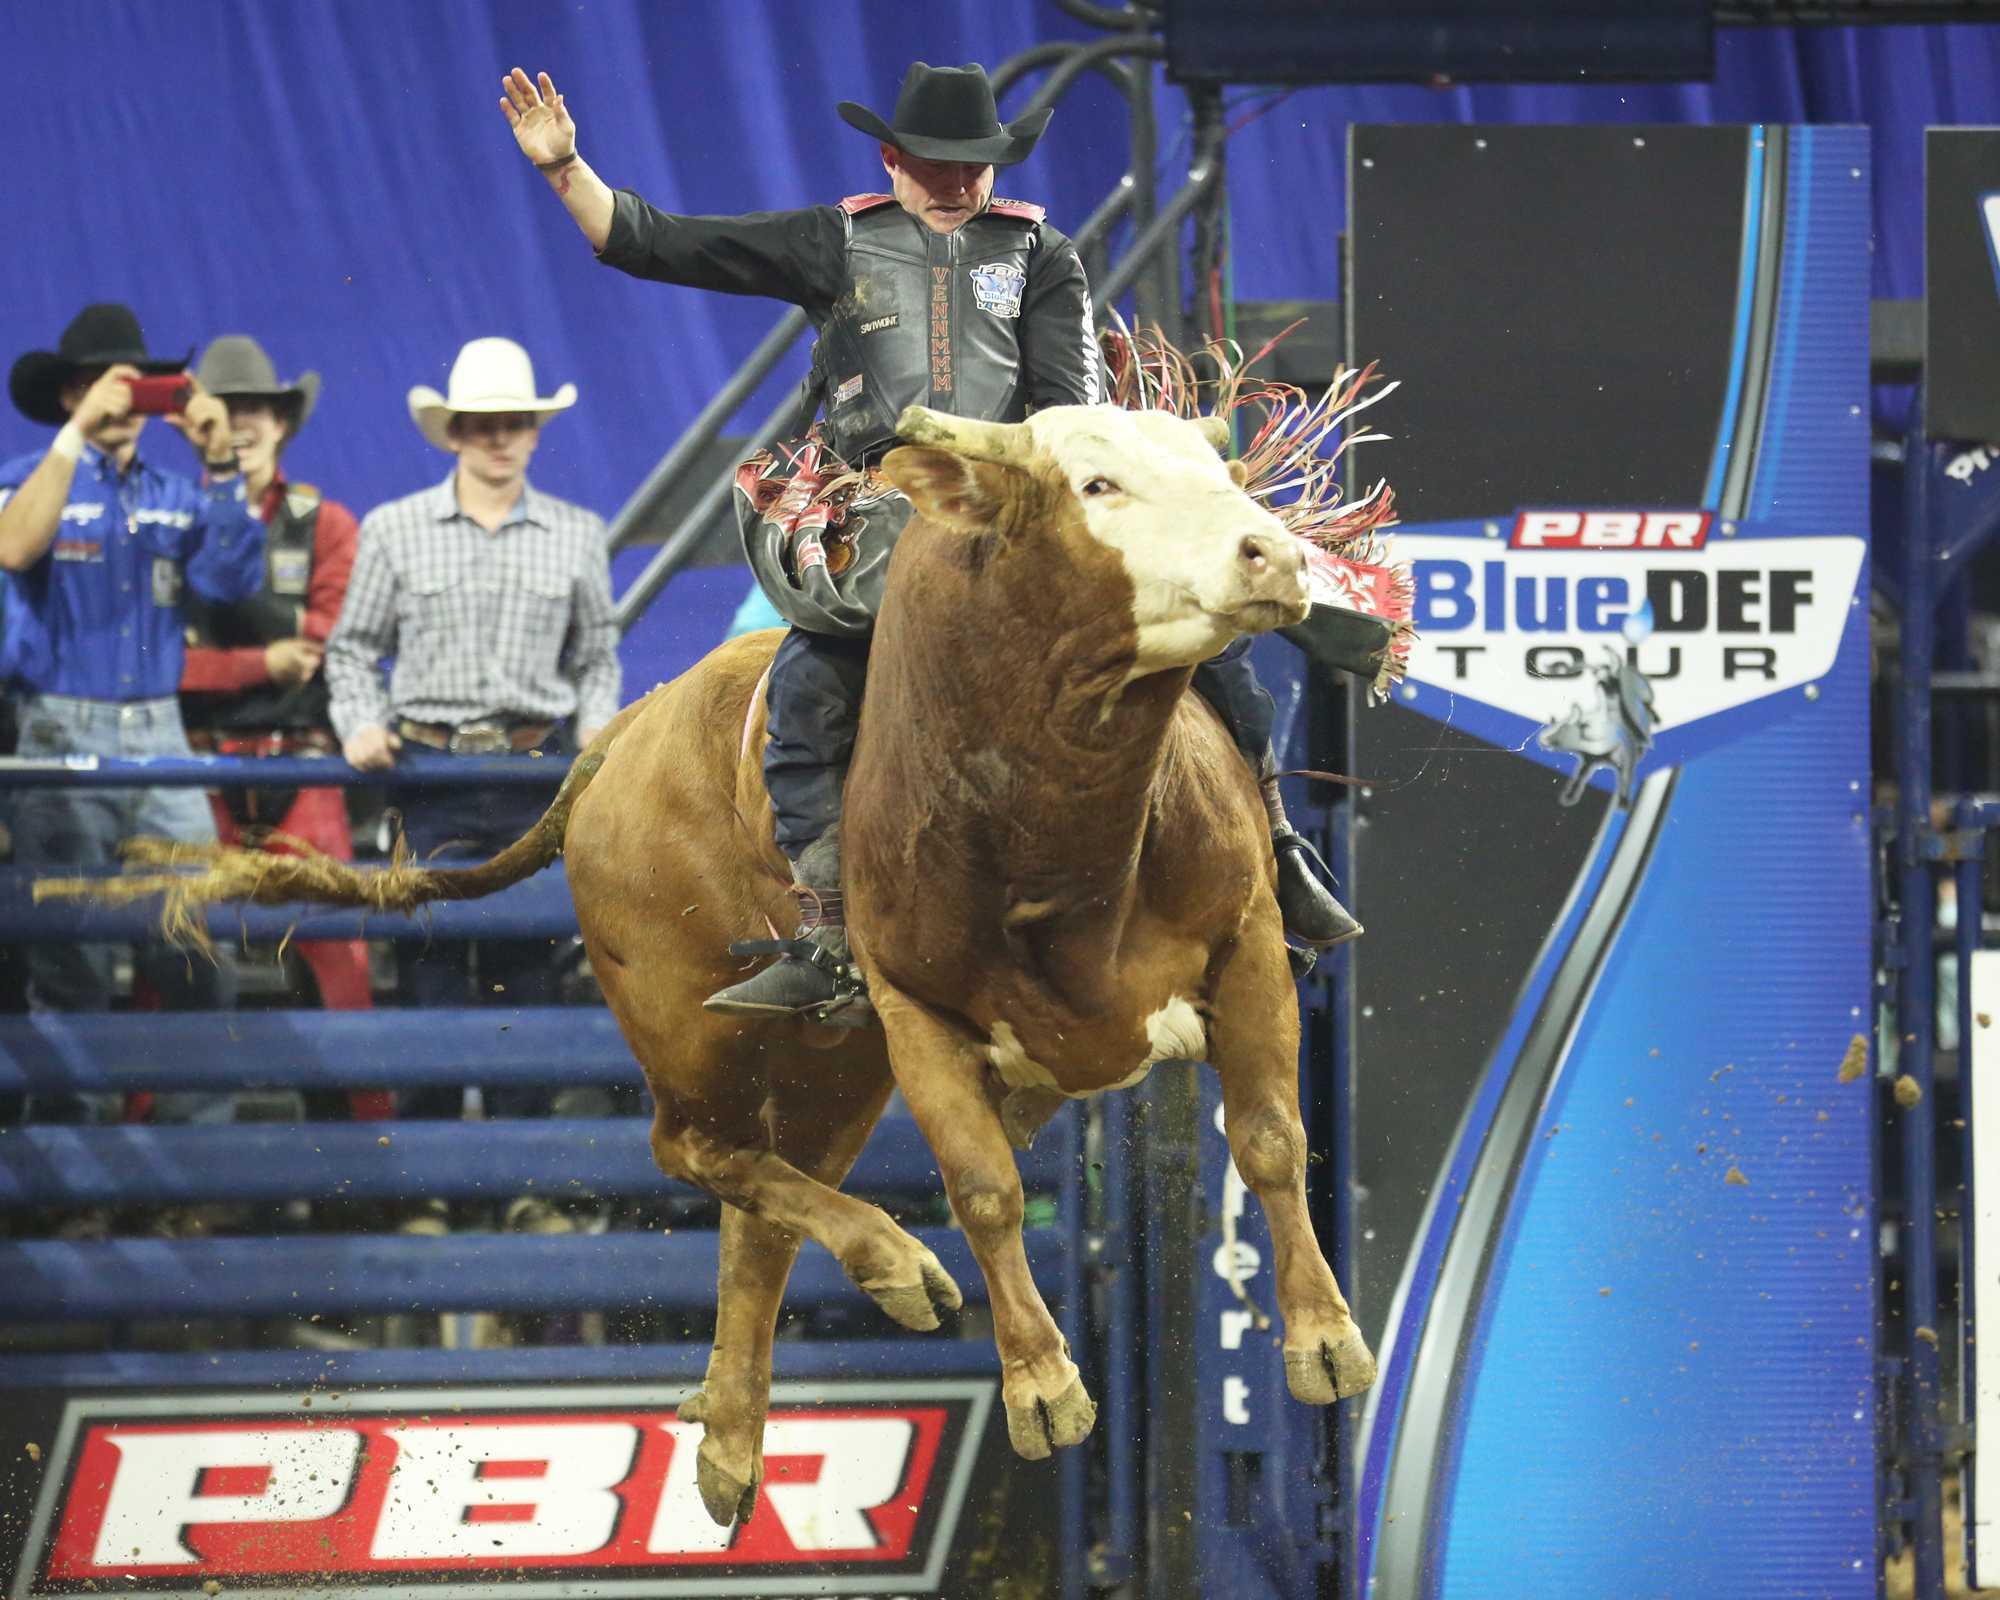 Venn Johns holds on tight as Deerango takes flight during the event Rabobank Arena on Saturday, Nov. 21.